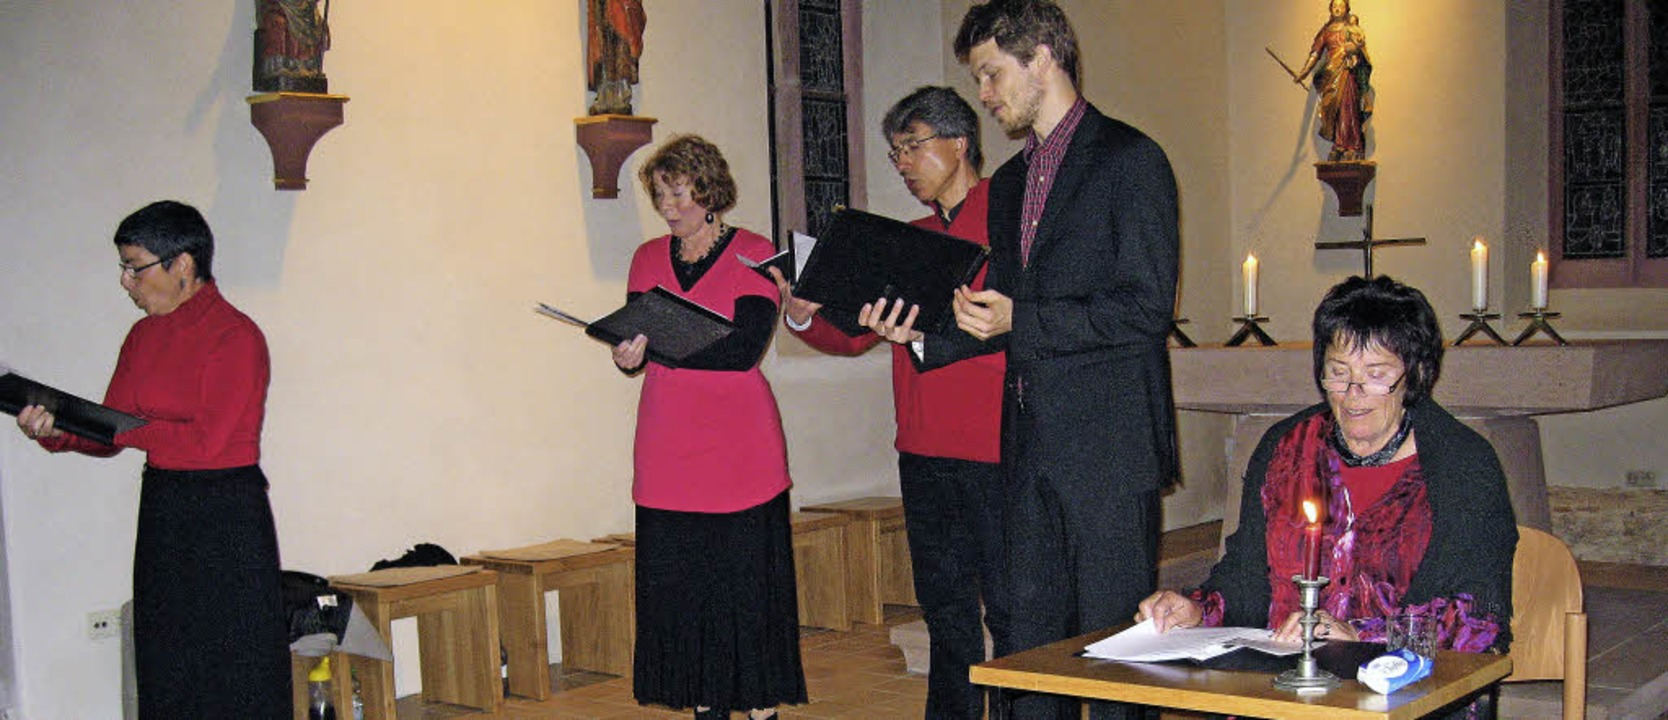 Ein Gesangsensemble (Micaela Seckinger...esang zur Liebe in der Bläsi-Kapelle.   | Foto: Hildegard Karig